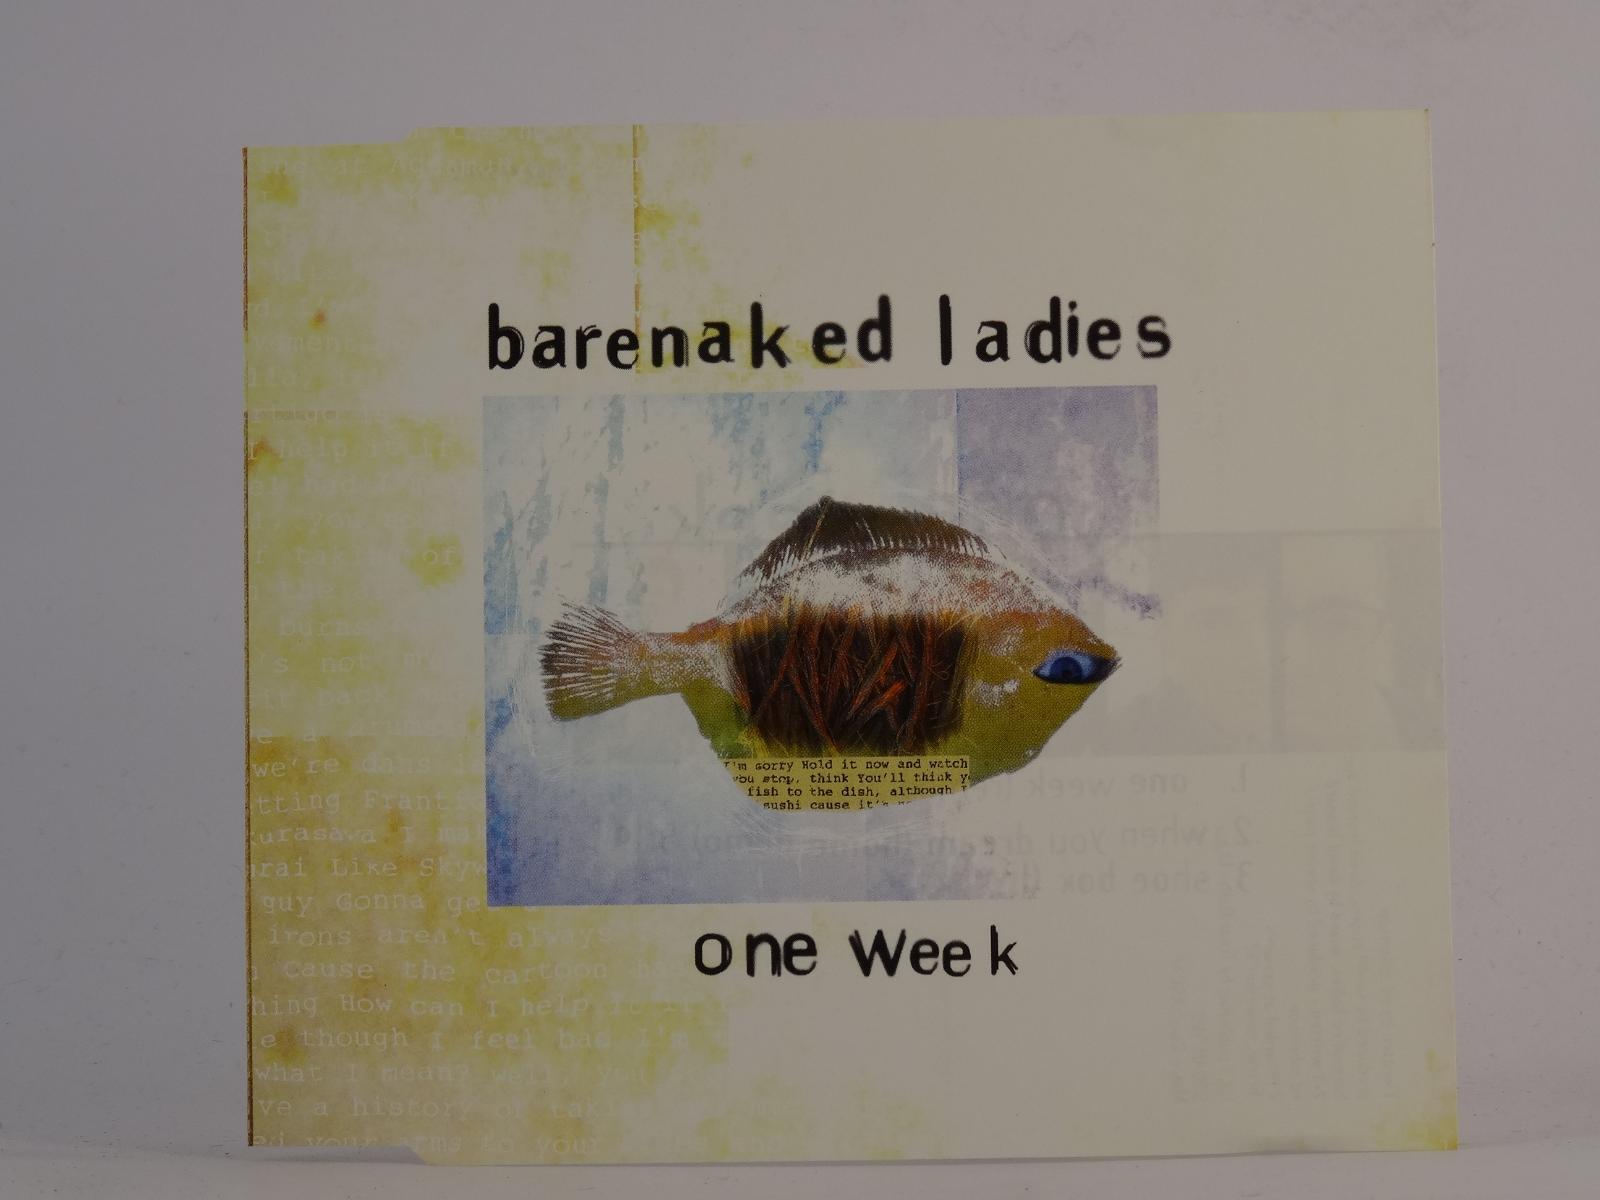 Barenaked lady one week